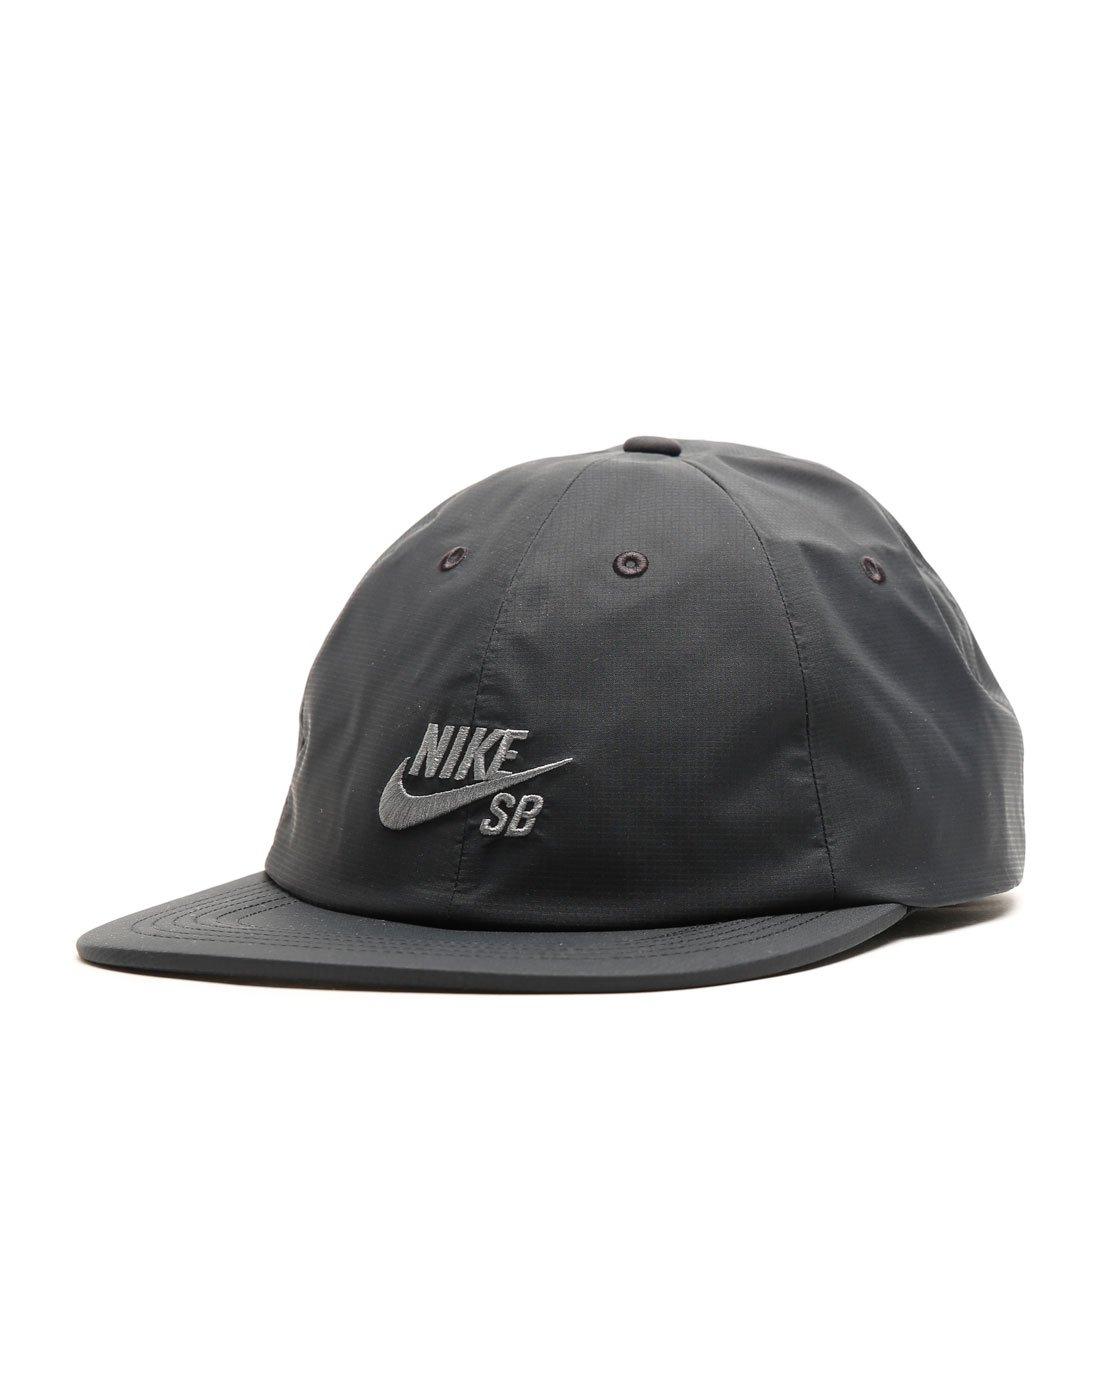 Nike SB Hombre Tapas/Gorros 86 Cap SB Waterproof, Negro/Negro/Cool ...